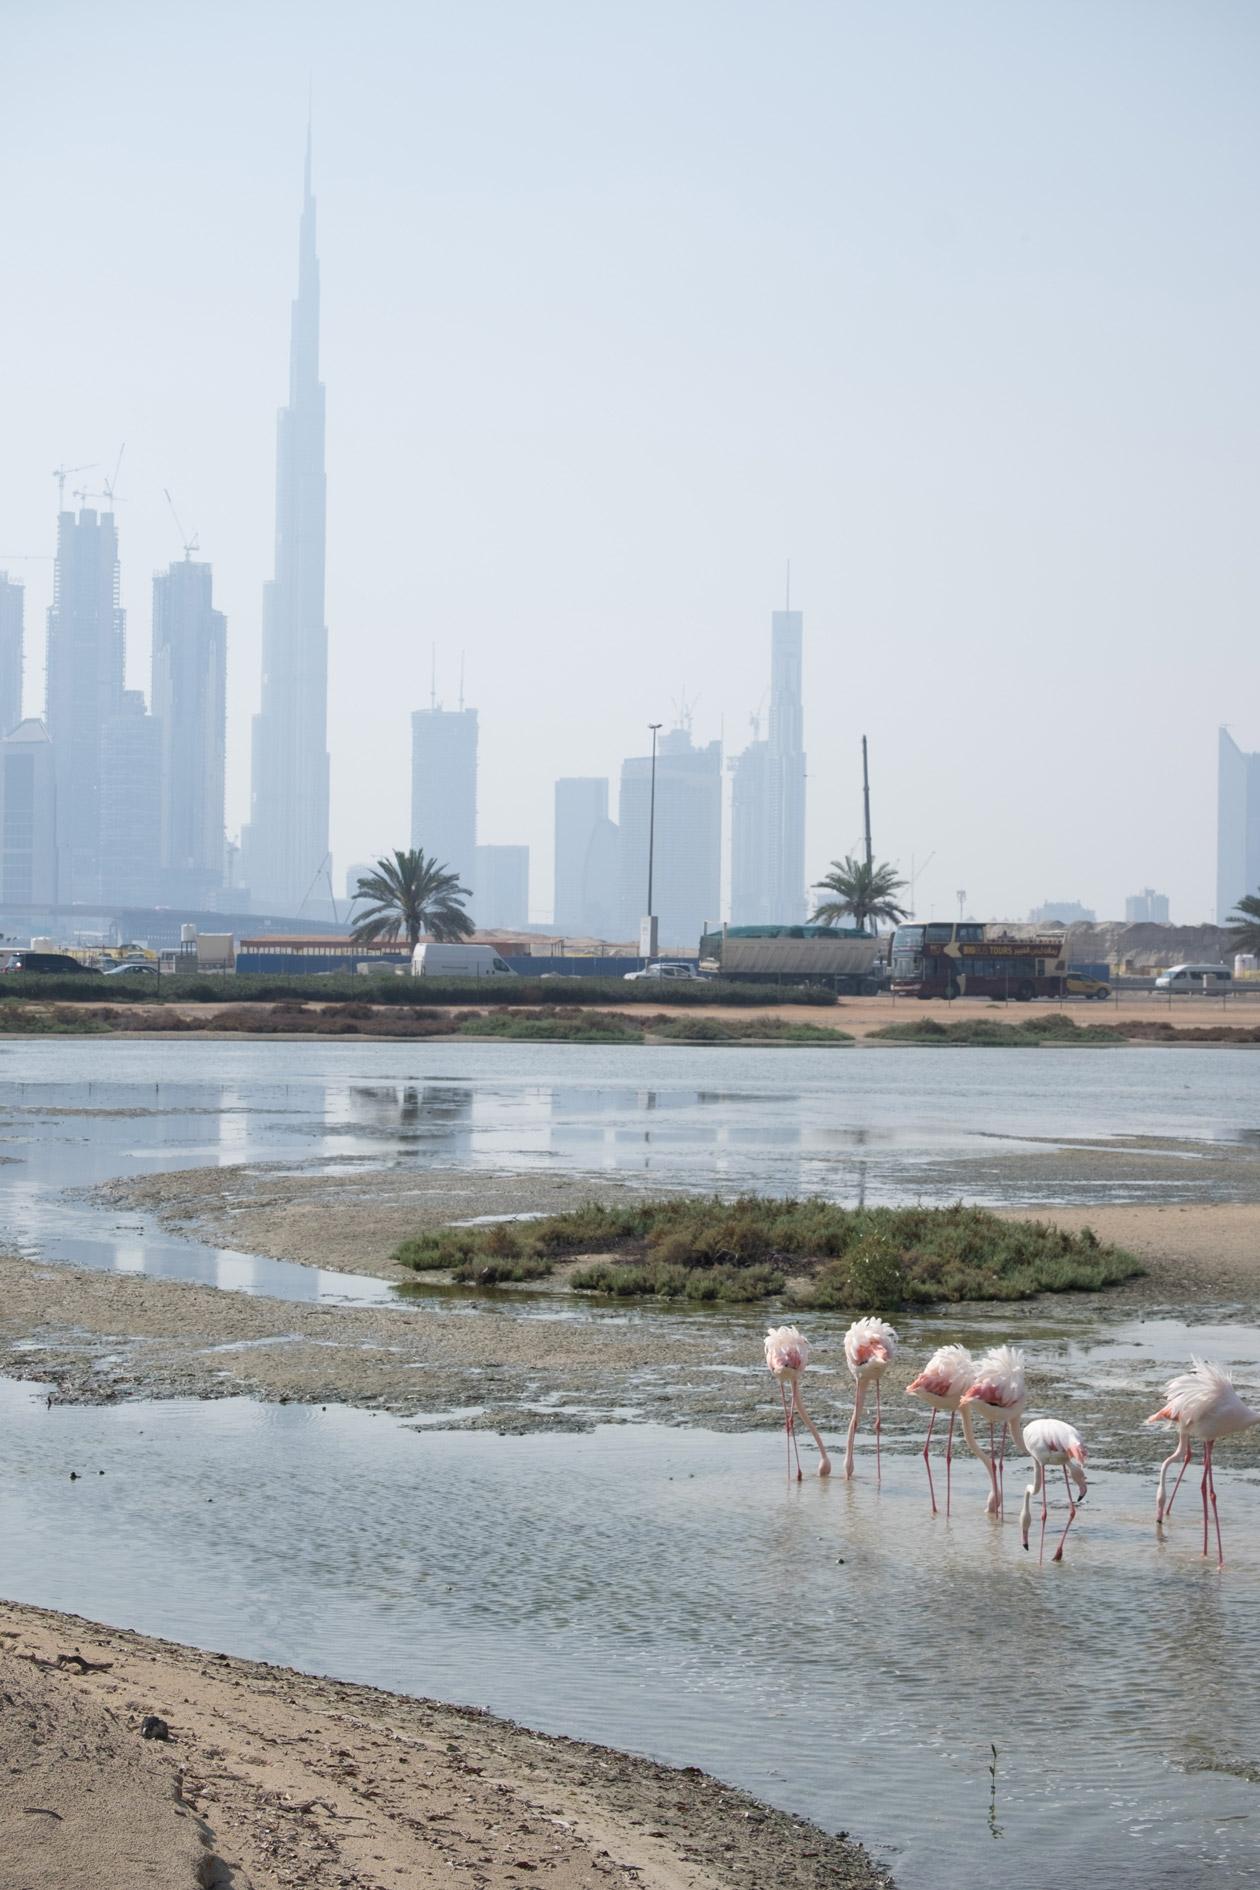 Flamingos at the Ras Al Khor wildlife sanctuary in Dubai, with the Burj Khalifa in the background